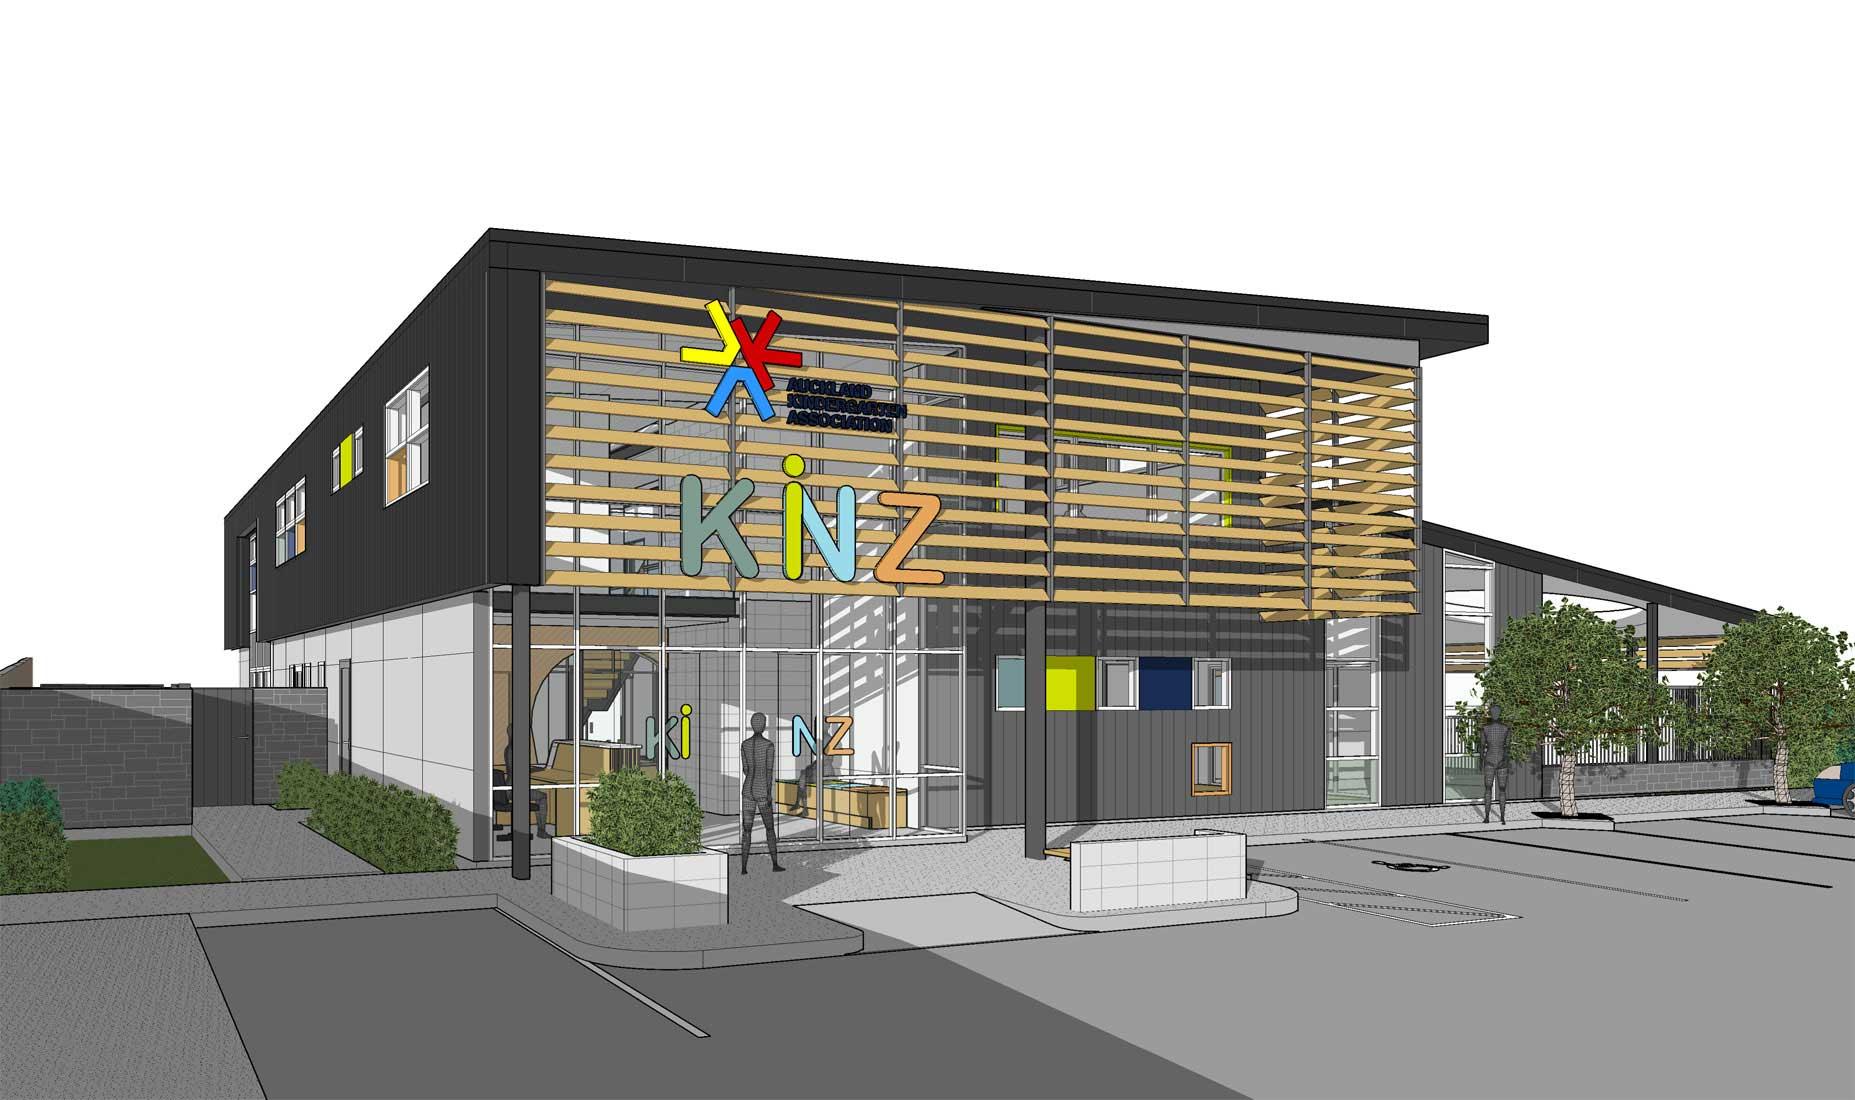 Kindergarten interior design image in 3d - Kinz Pt Chev 1 East 3d Web